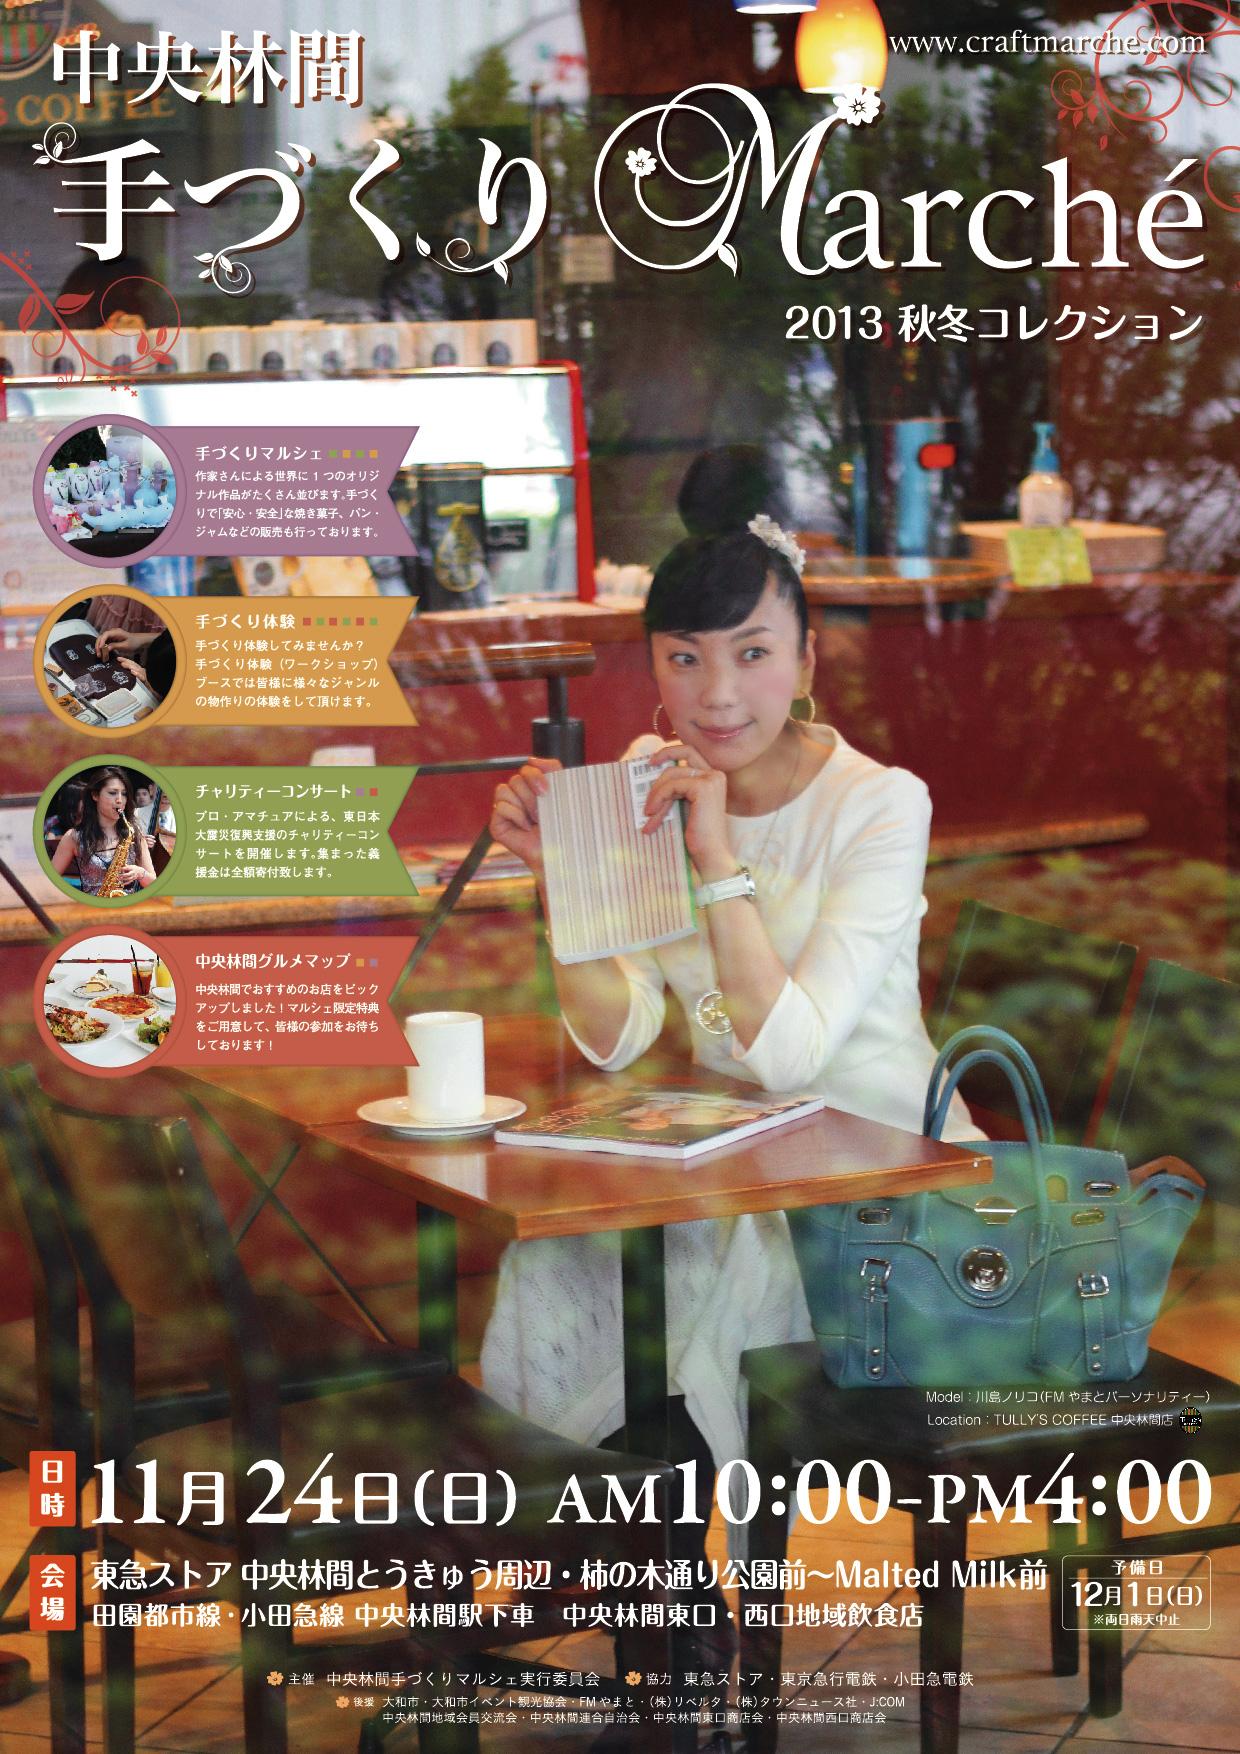 craftmacrhe2013aw_poster.jpg